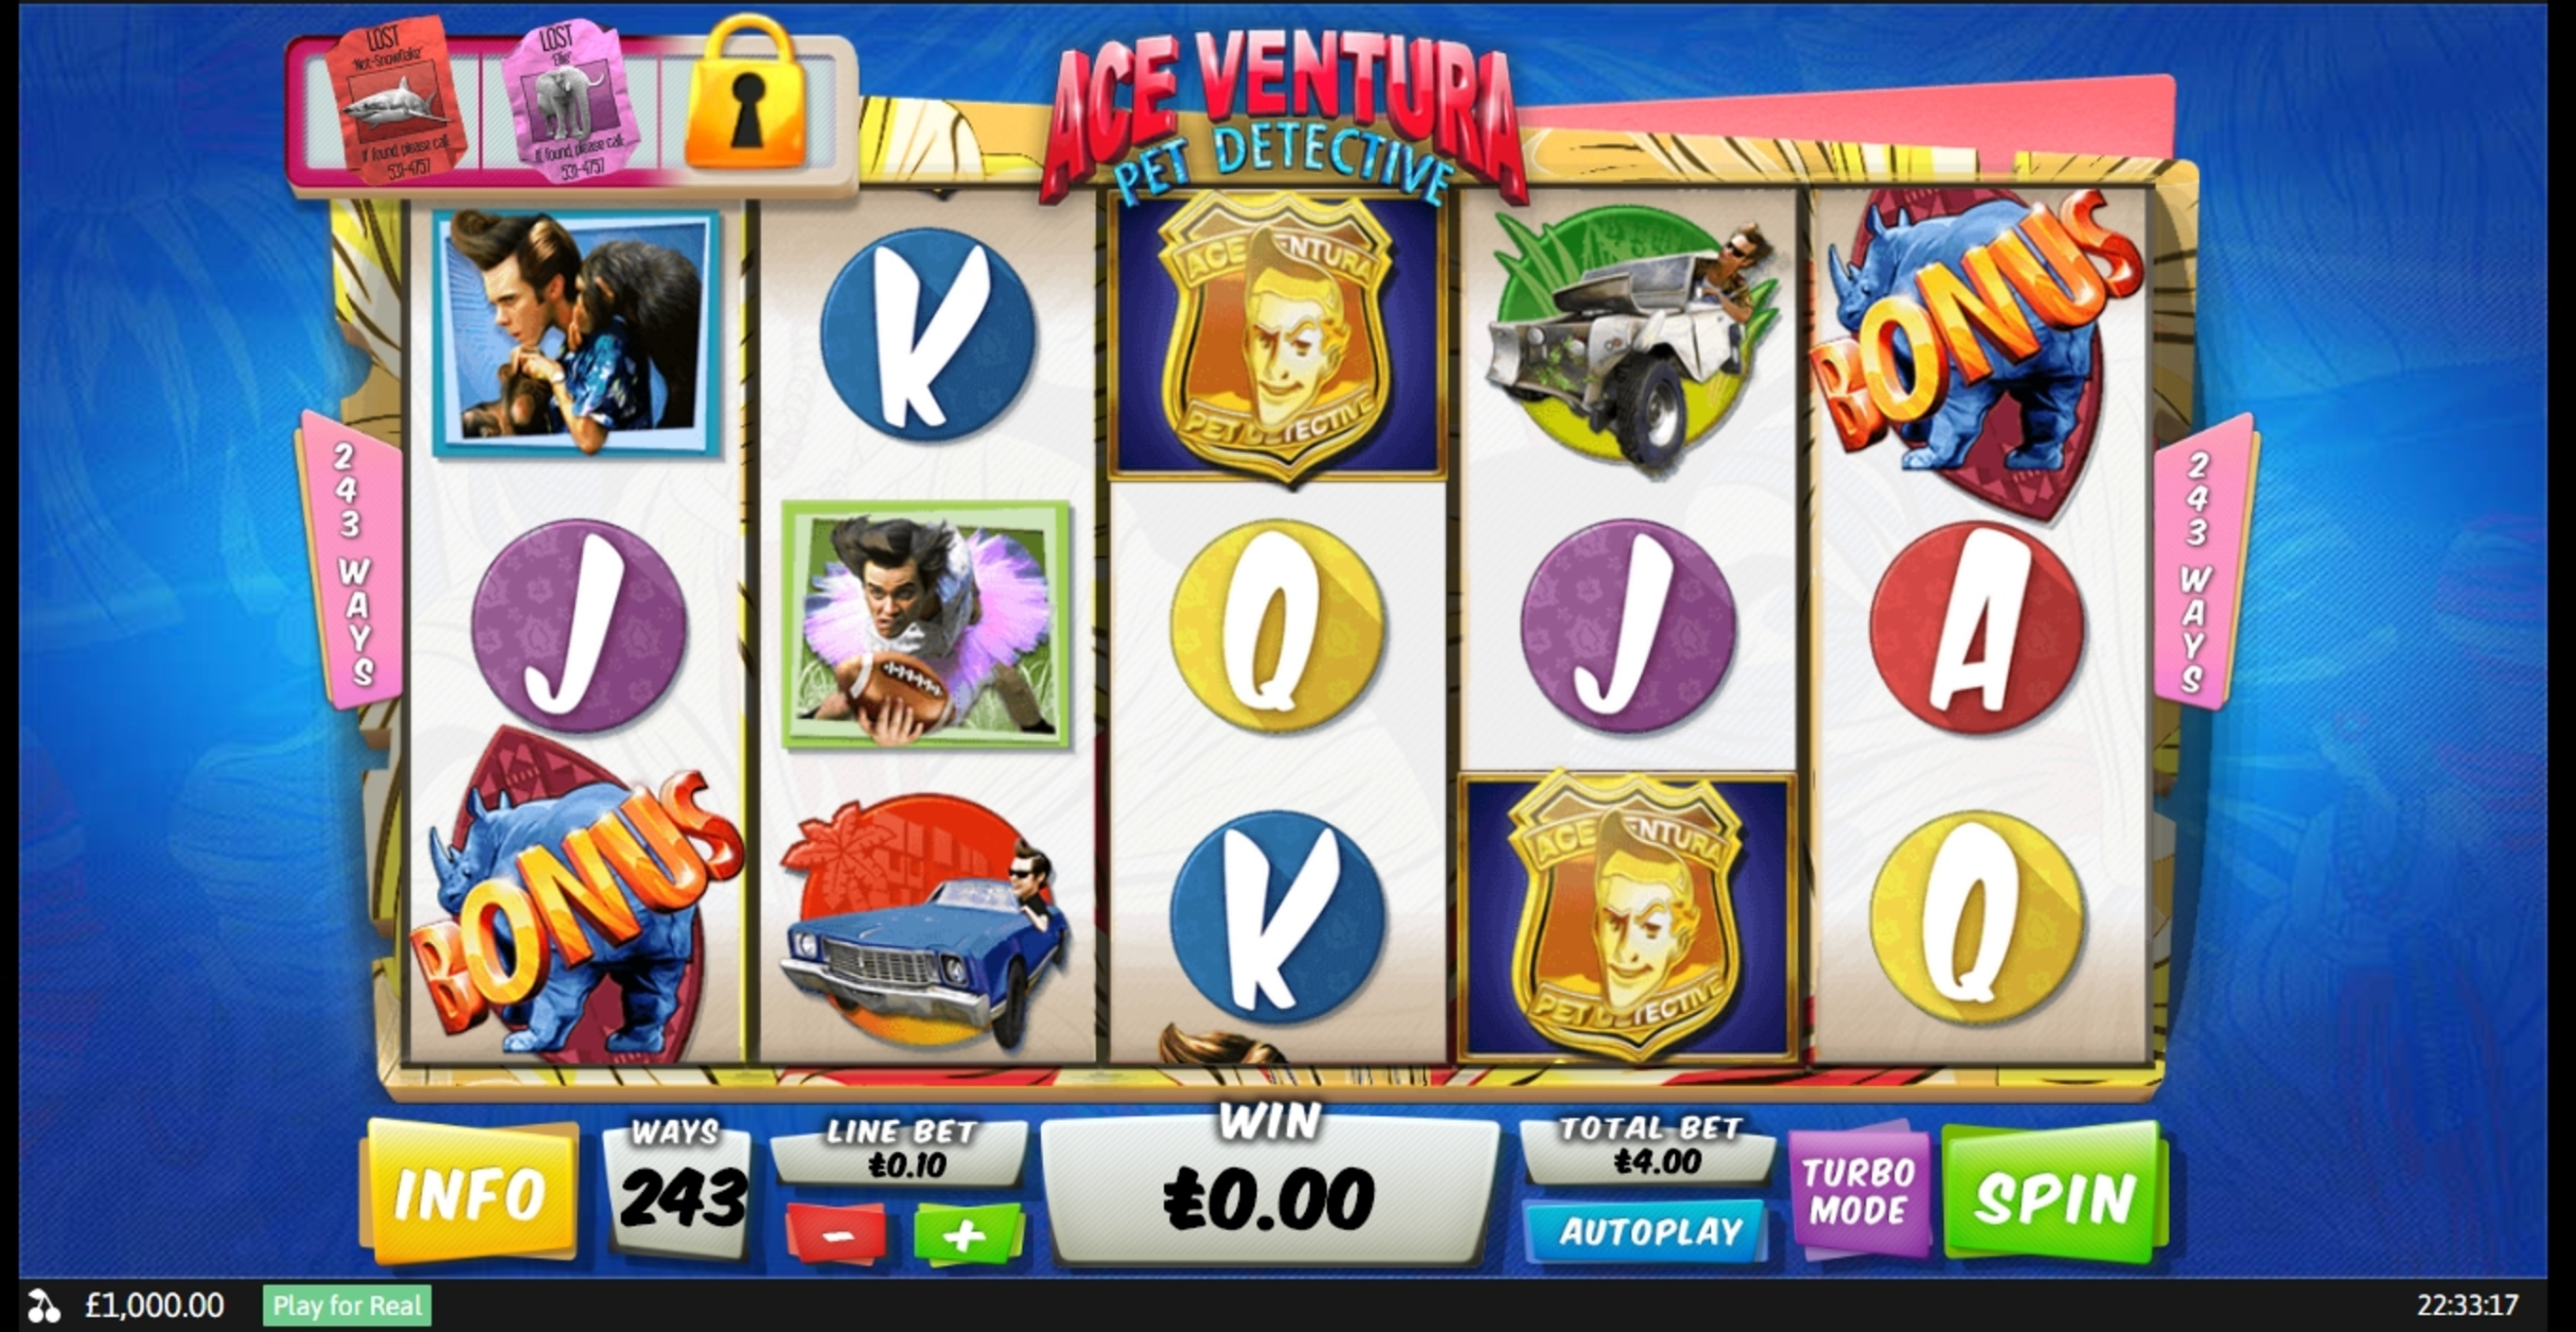 Ace Ventura Slot Machine